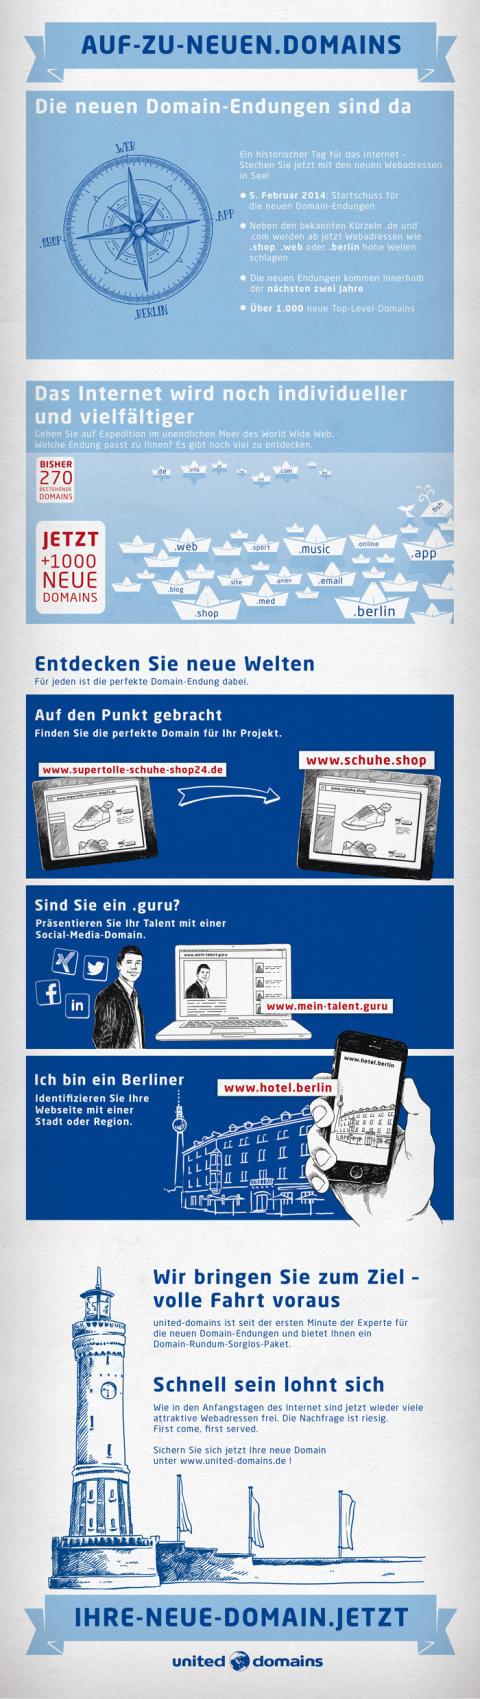 Infografik: Auf zu neuen Domains!